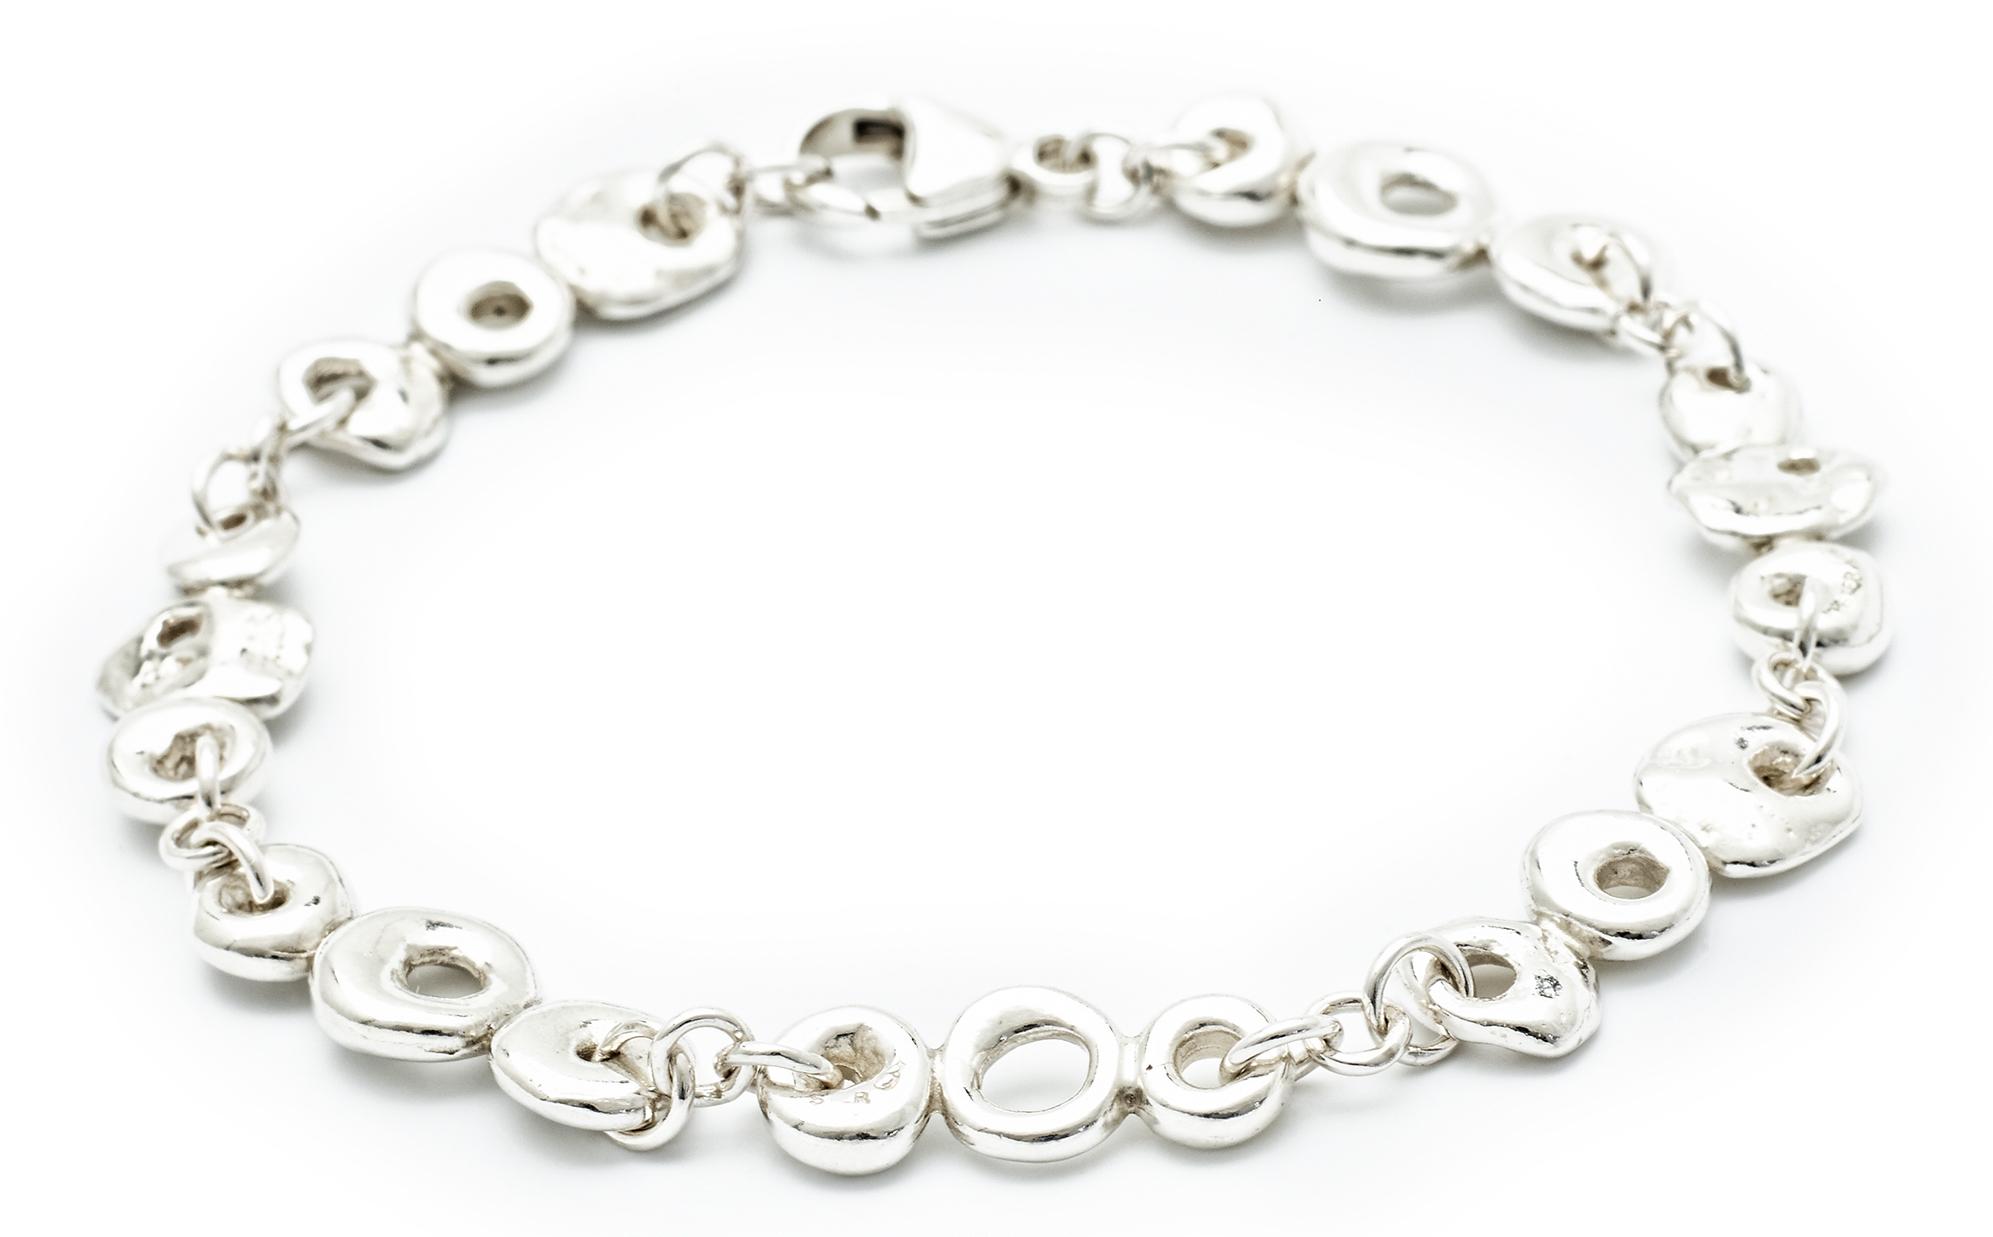 Johanna Brierley Beach Stone bracelet | JCK On Your Market